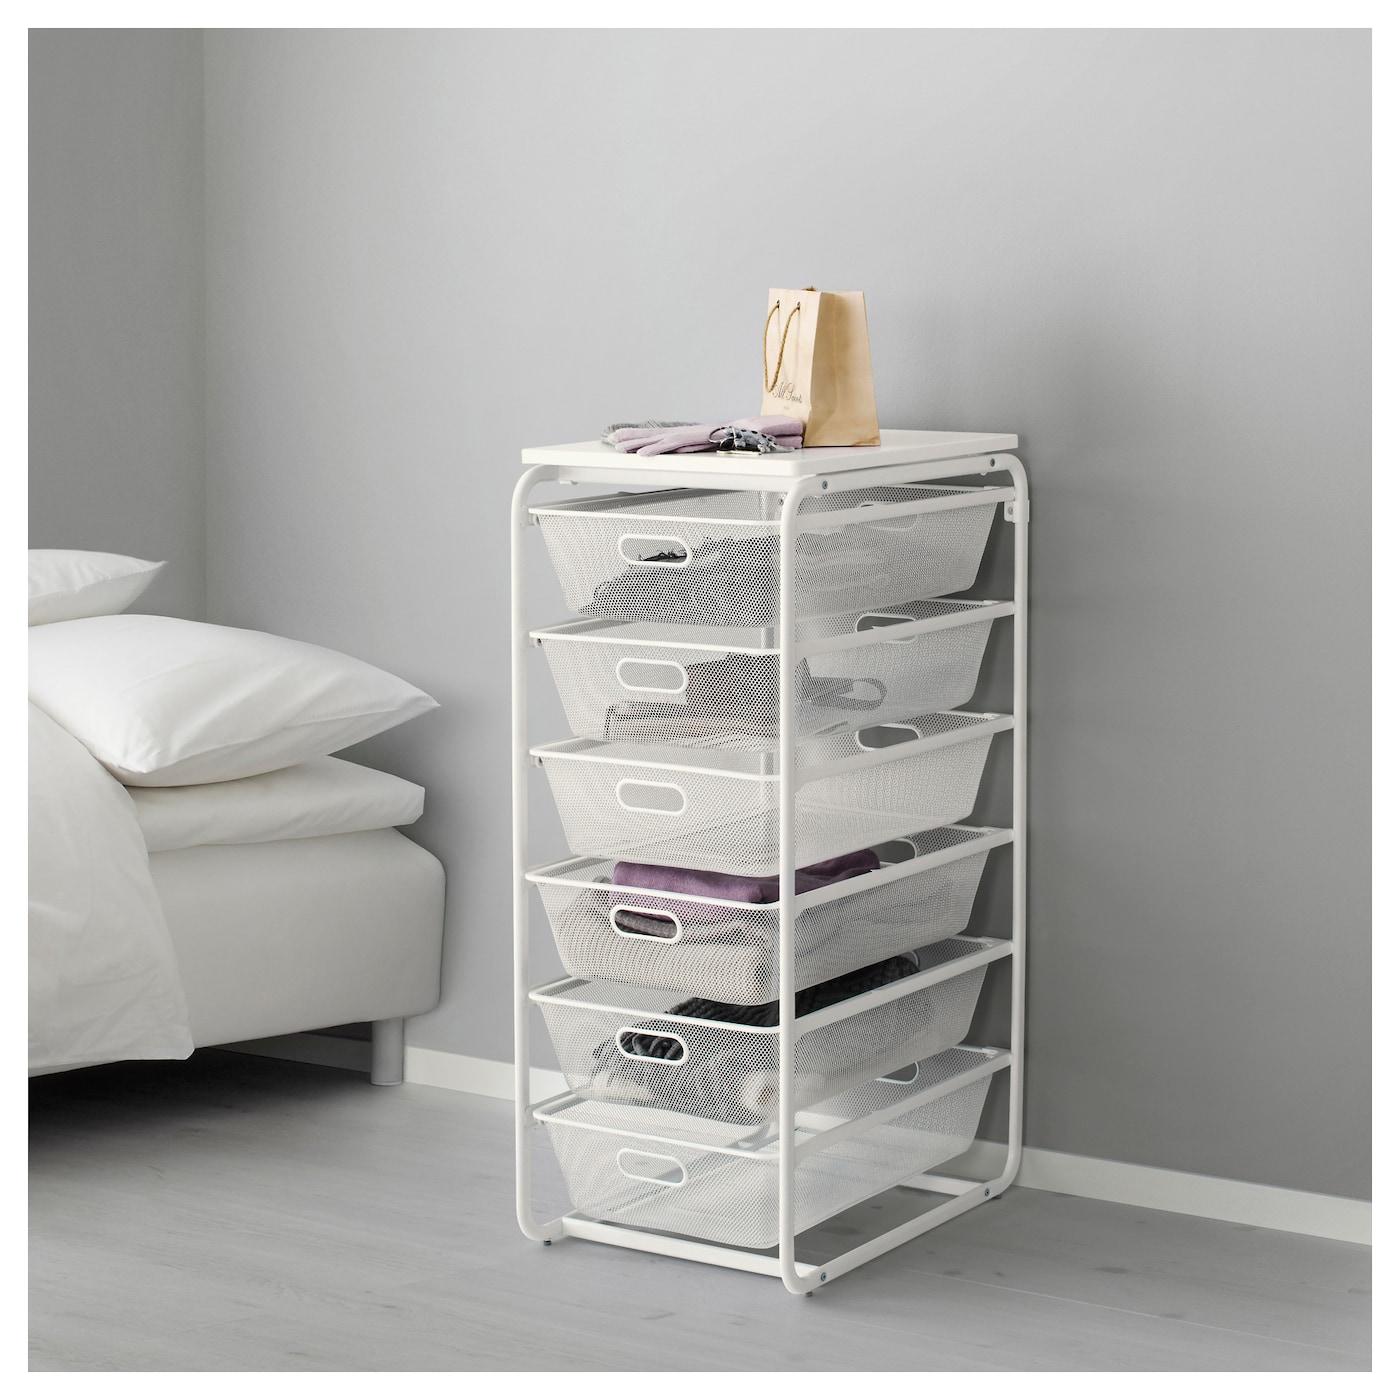 algot structure 6corbeilles filet tab sup blanc 41x60x105 cm ikea. Black Bedroom Furniture Sets. Home Design Ideas